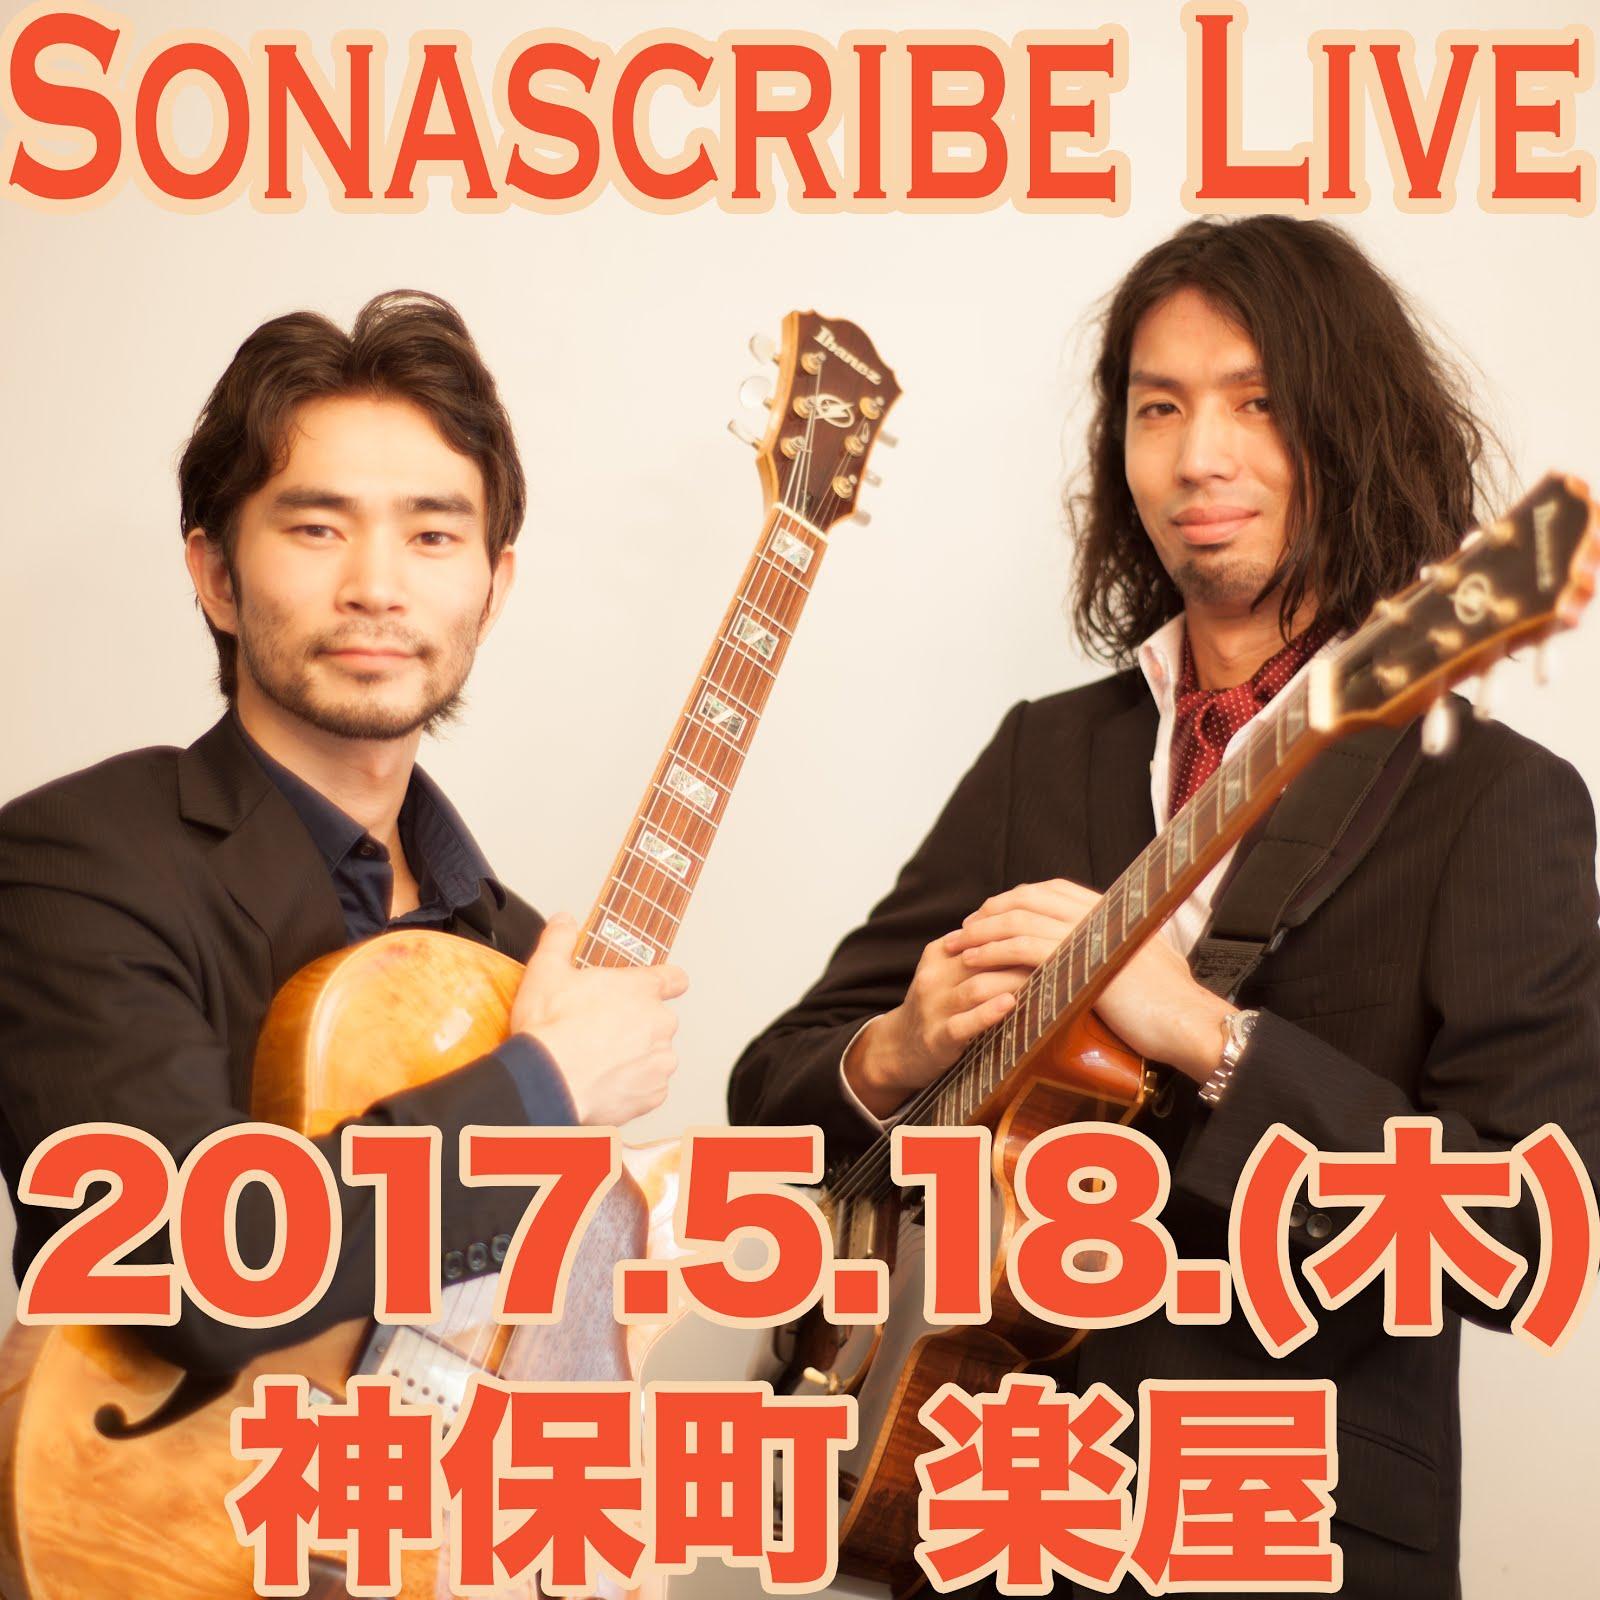 【Live info】神保町 楽屋 2017/5/18(木)